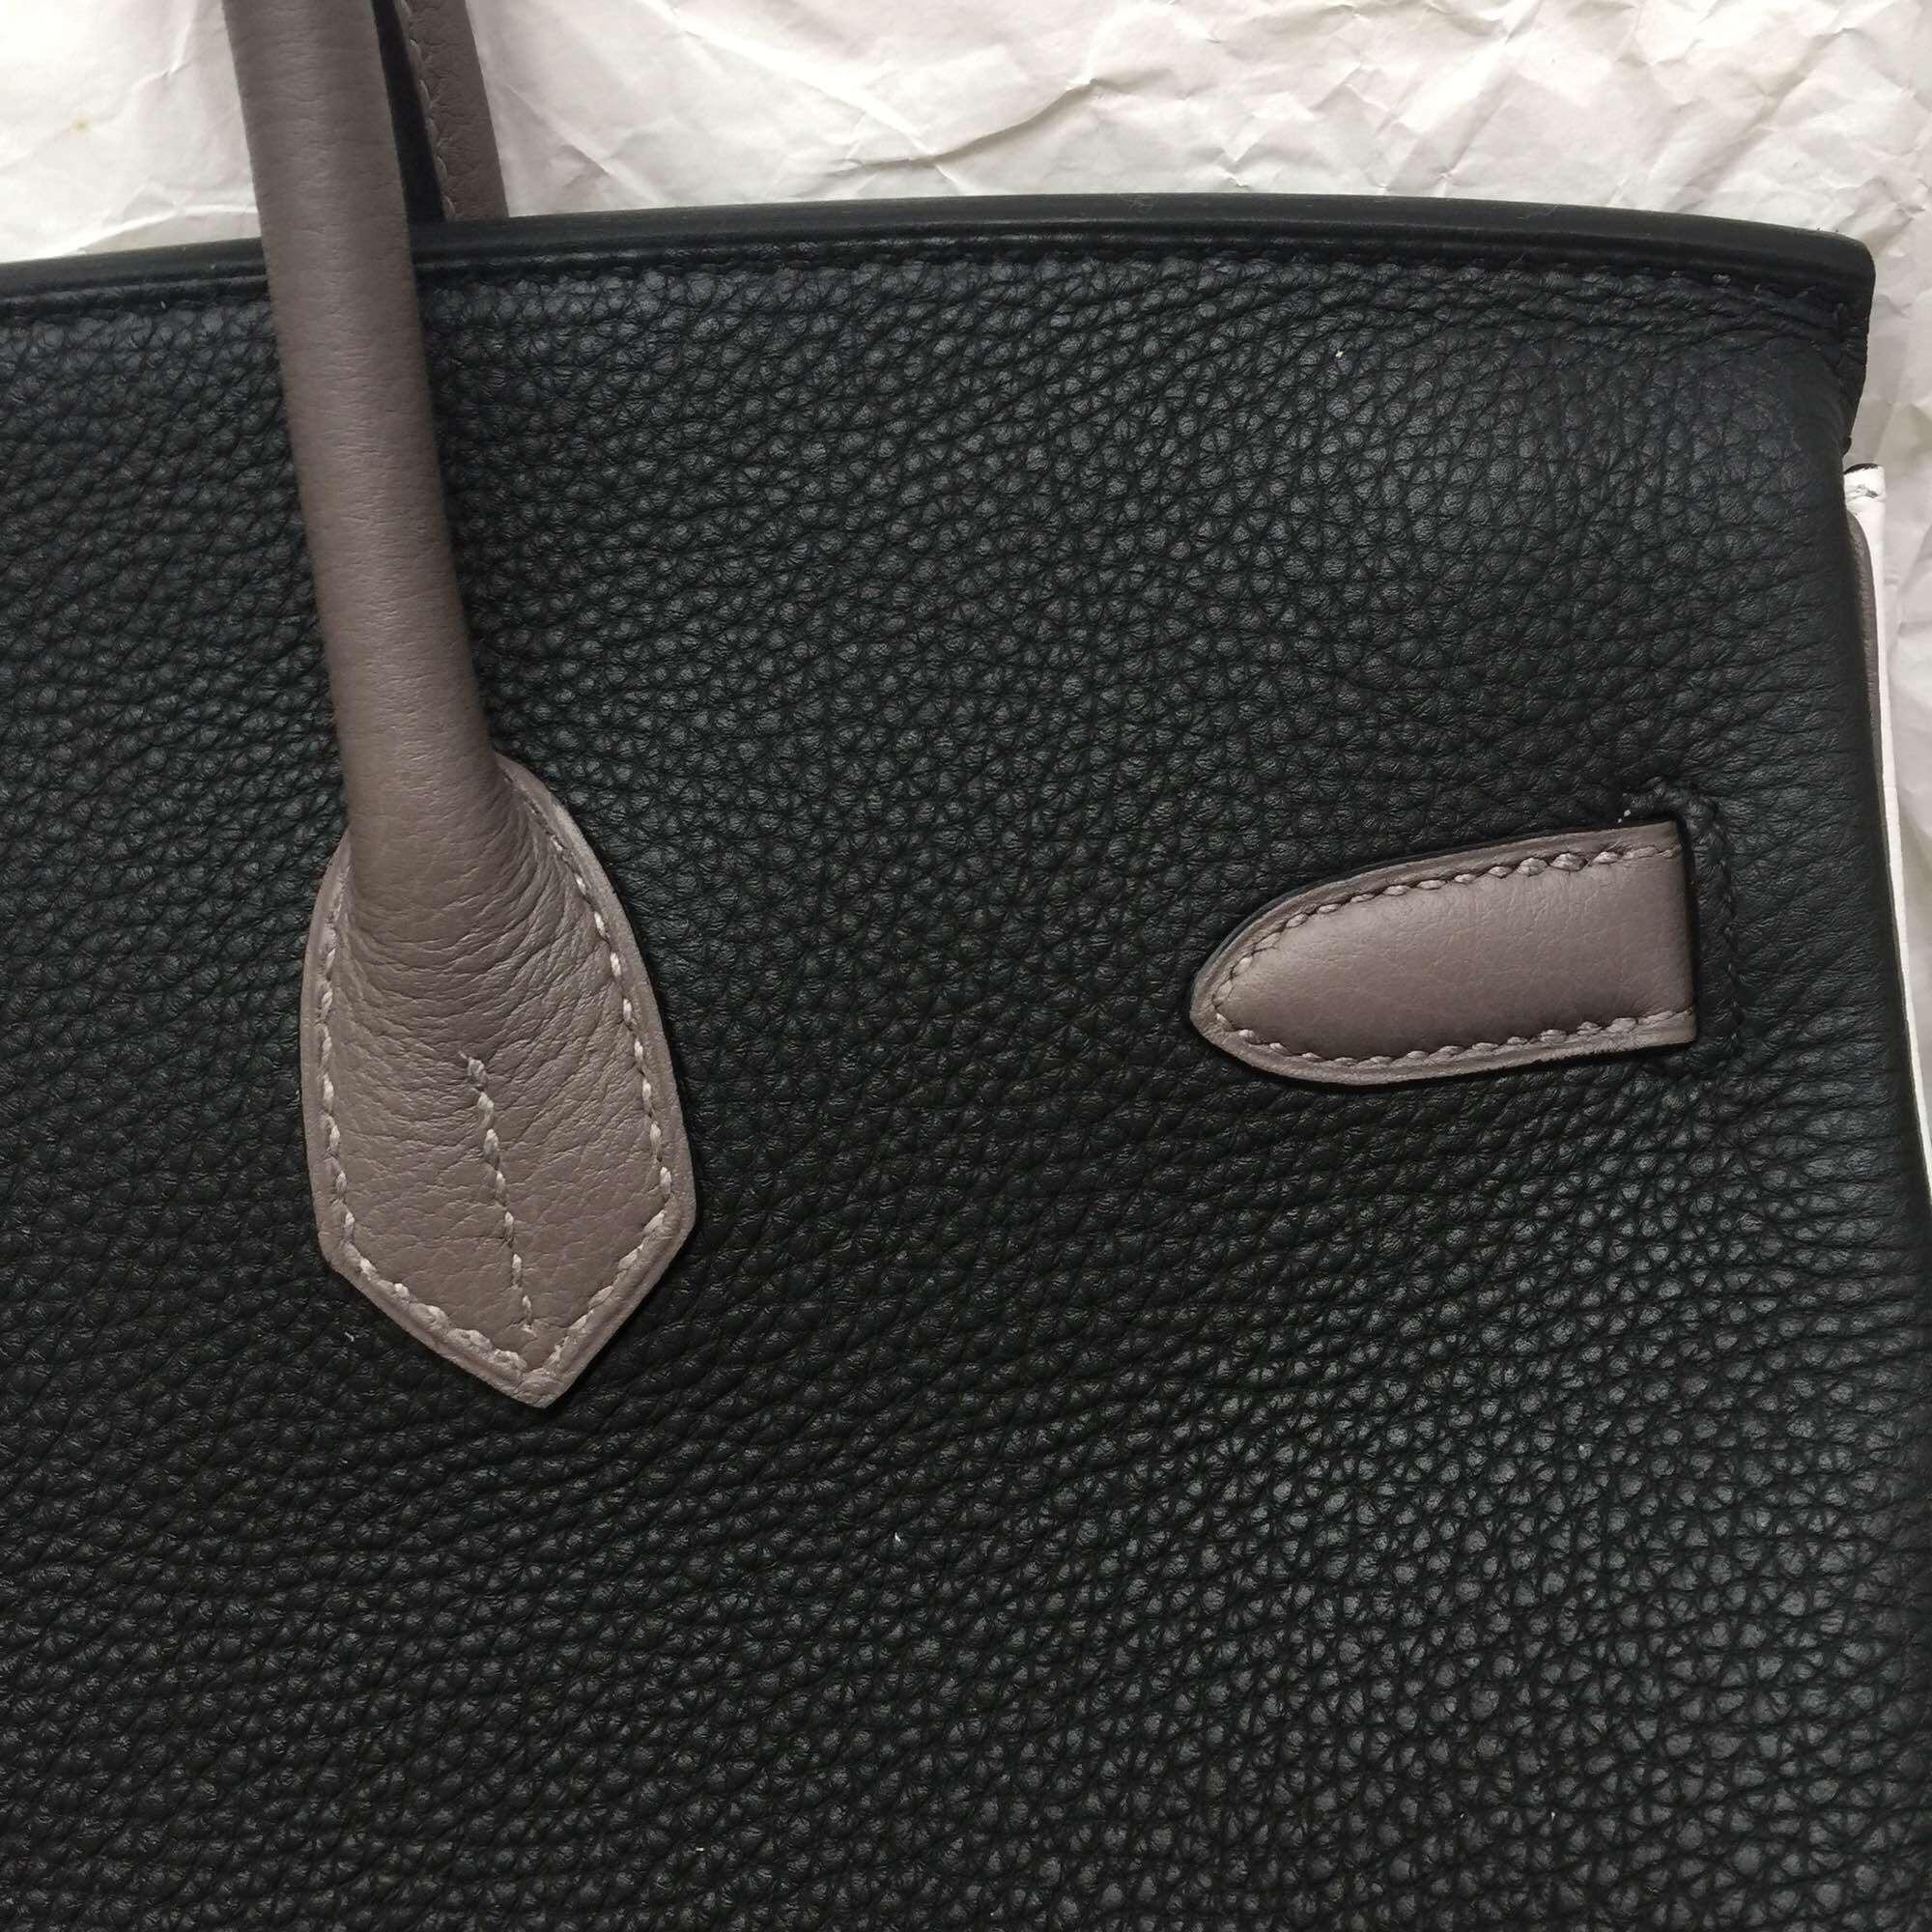 Discount Hermes Black/White/Etain Grey Togo Leather Birkin Bag 30cm Online